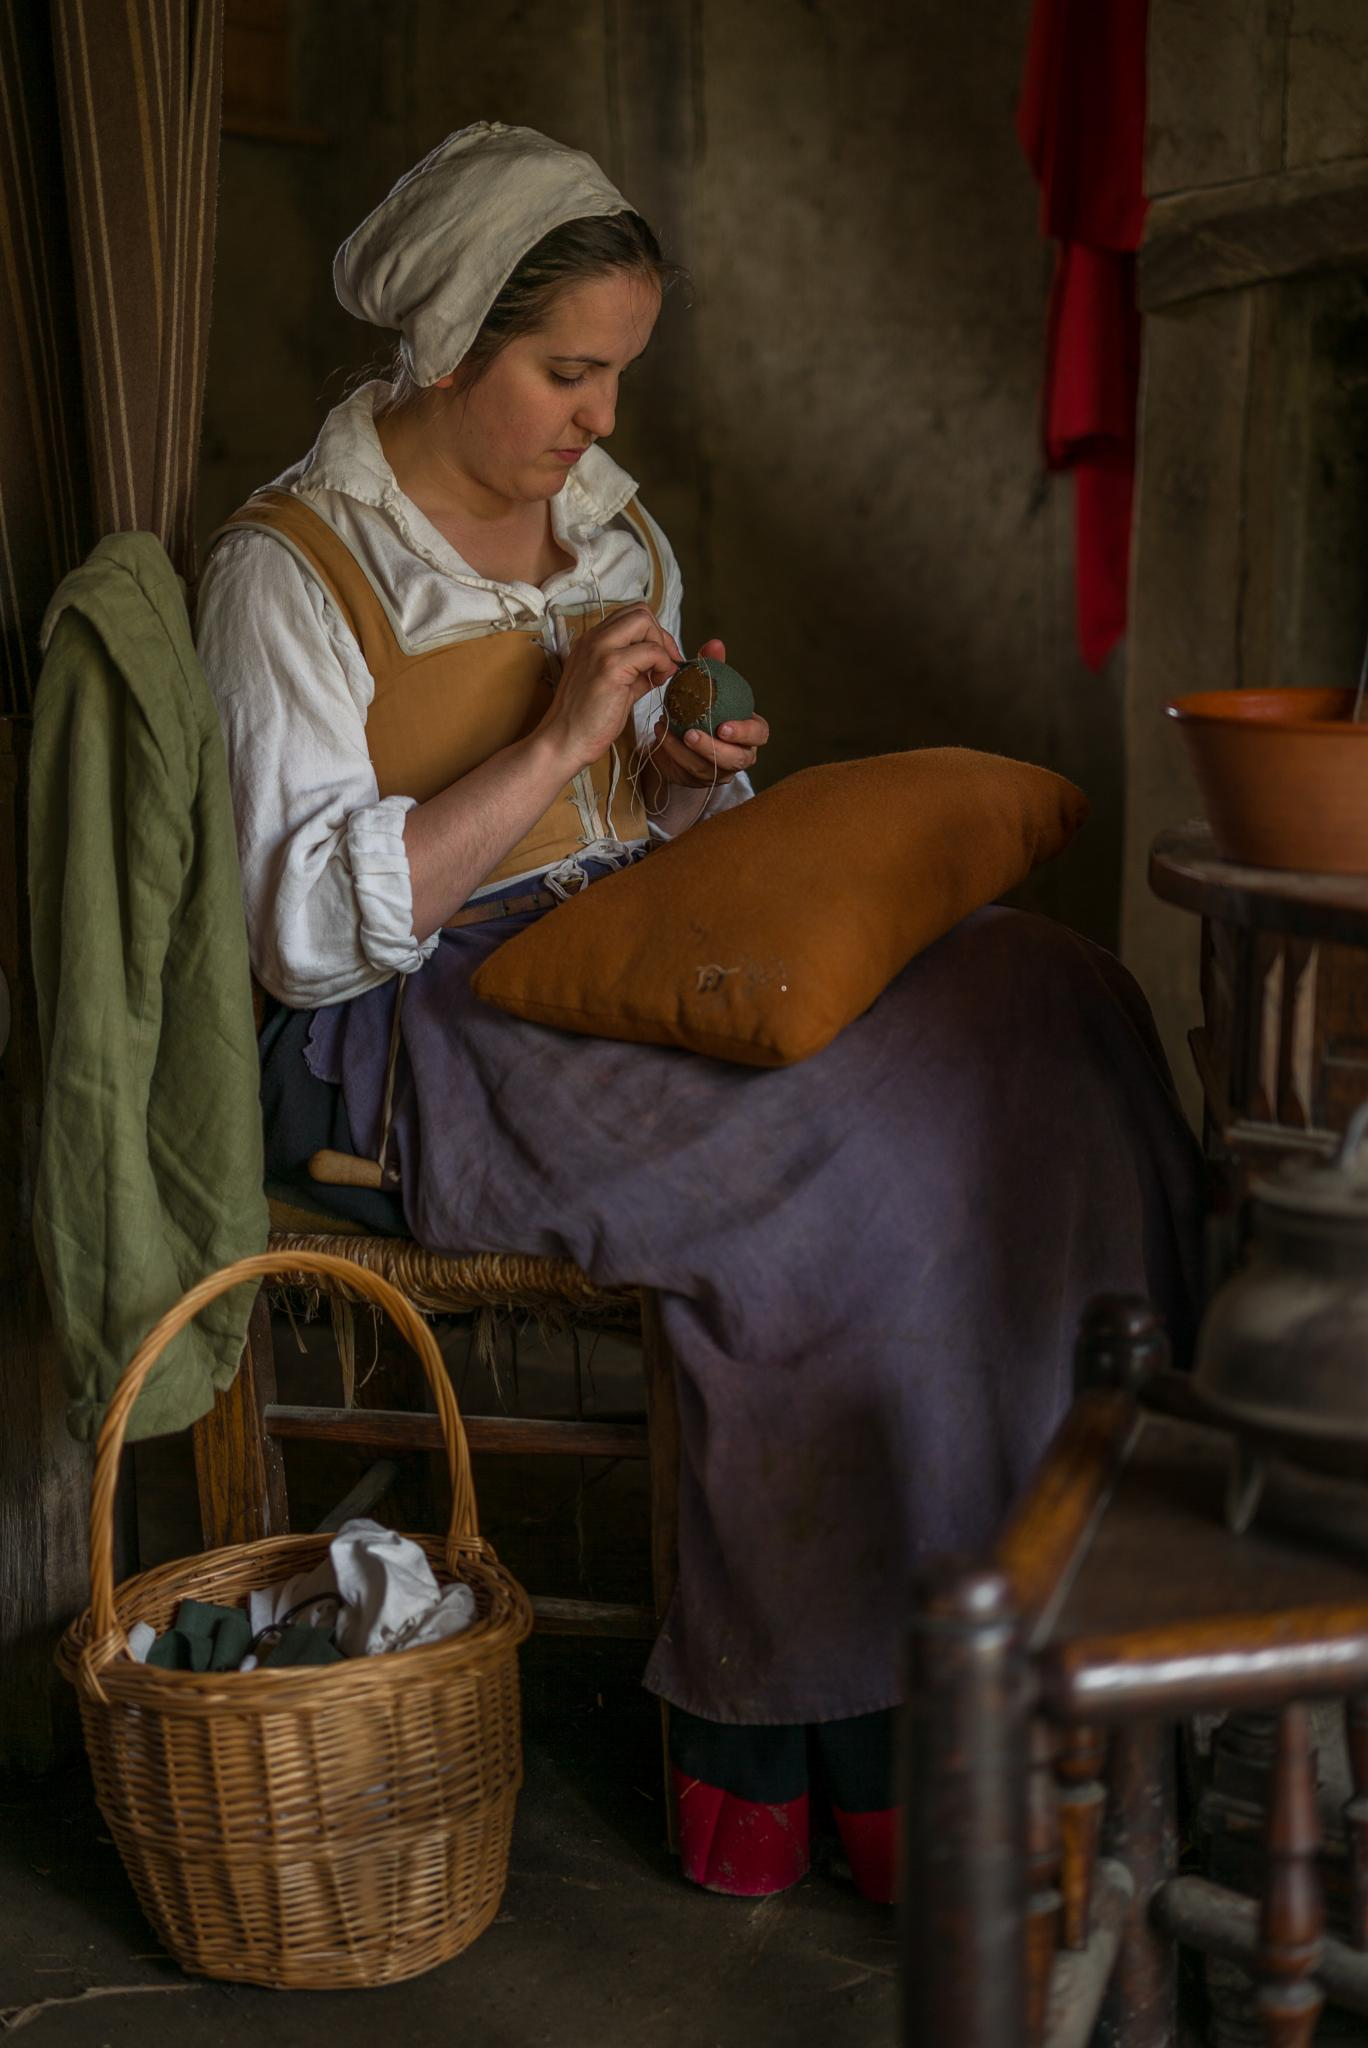 Sewing by Sean Sweeney